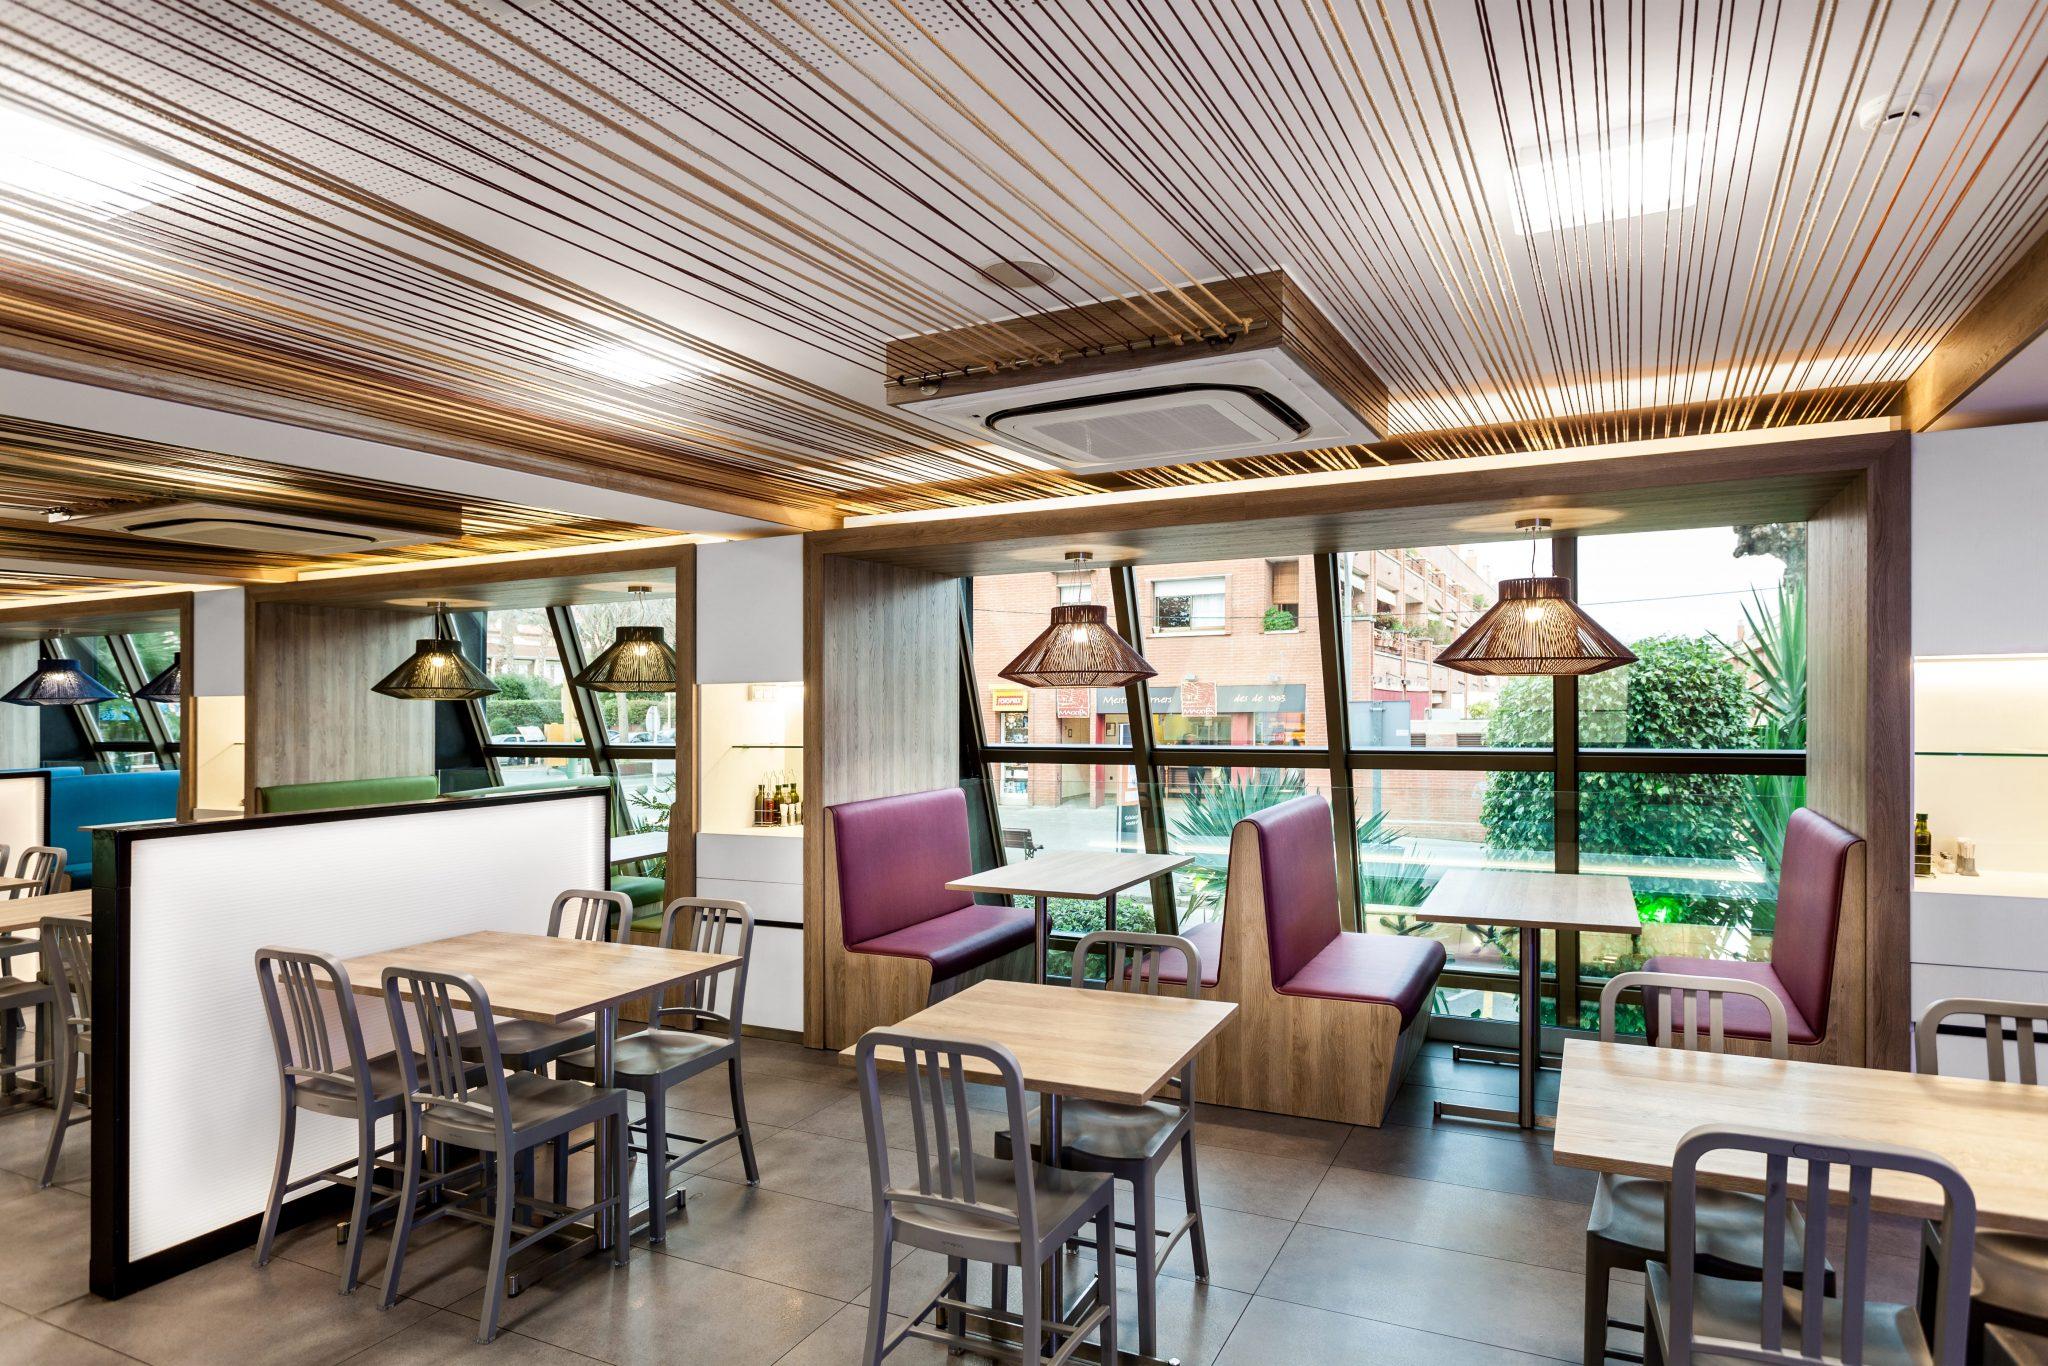 Diseño Interior del Restaurante Pizzeria Atlantida Vilassar de Mar, Barcelona - Rosa Colet